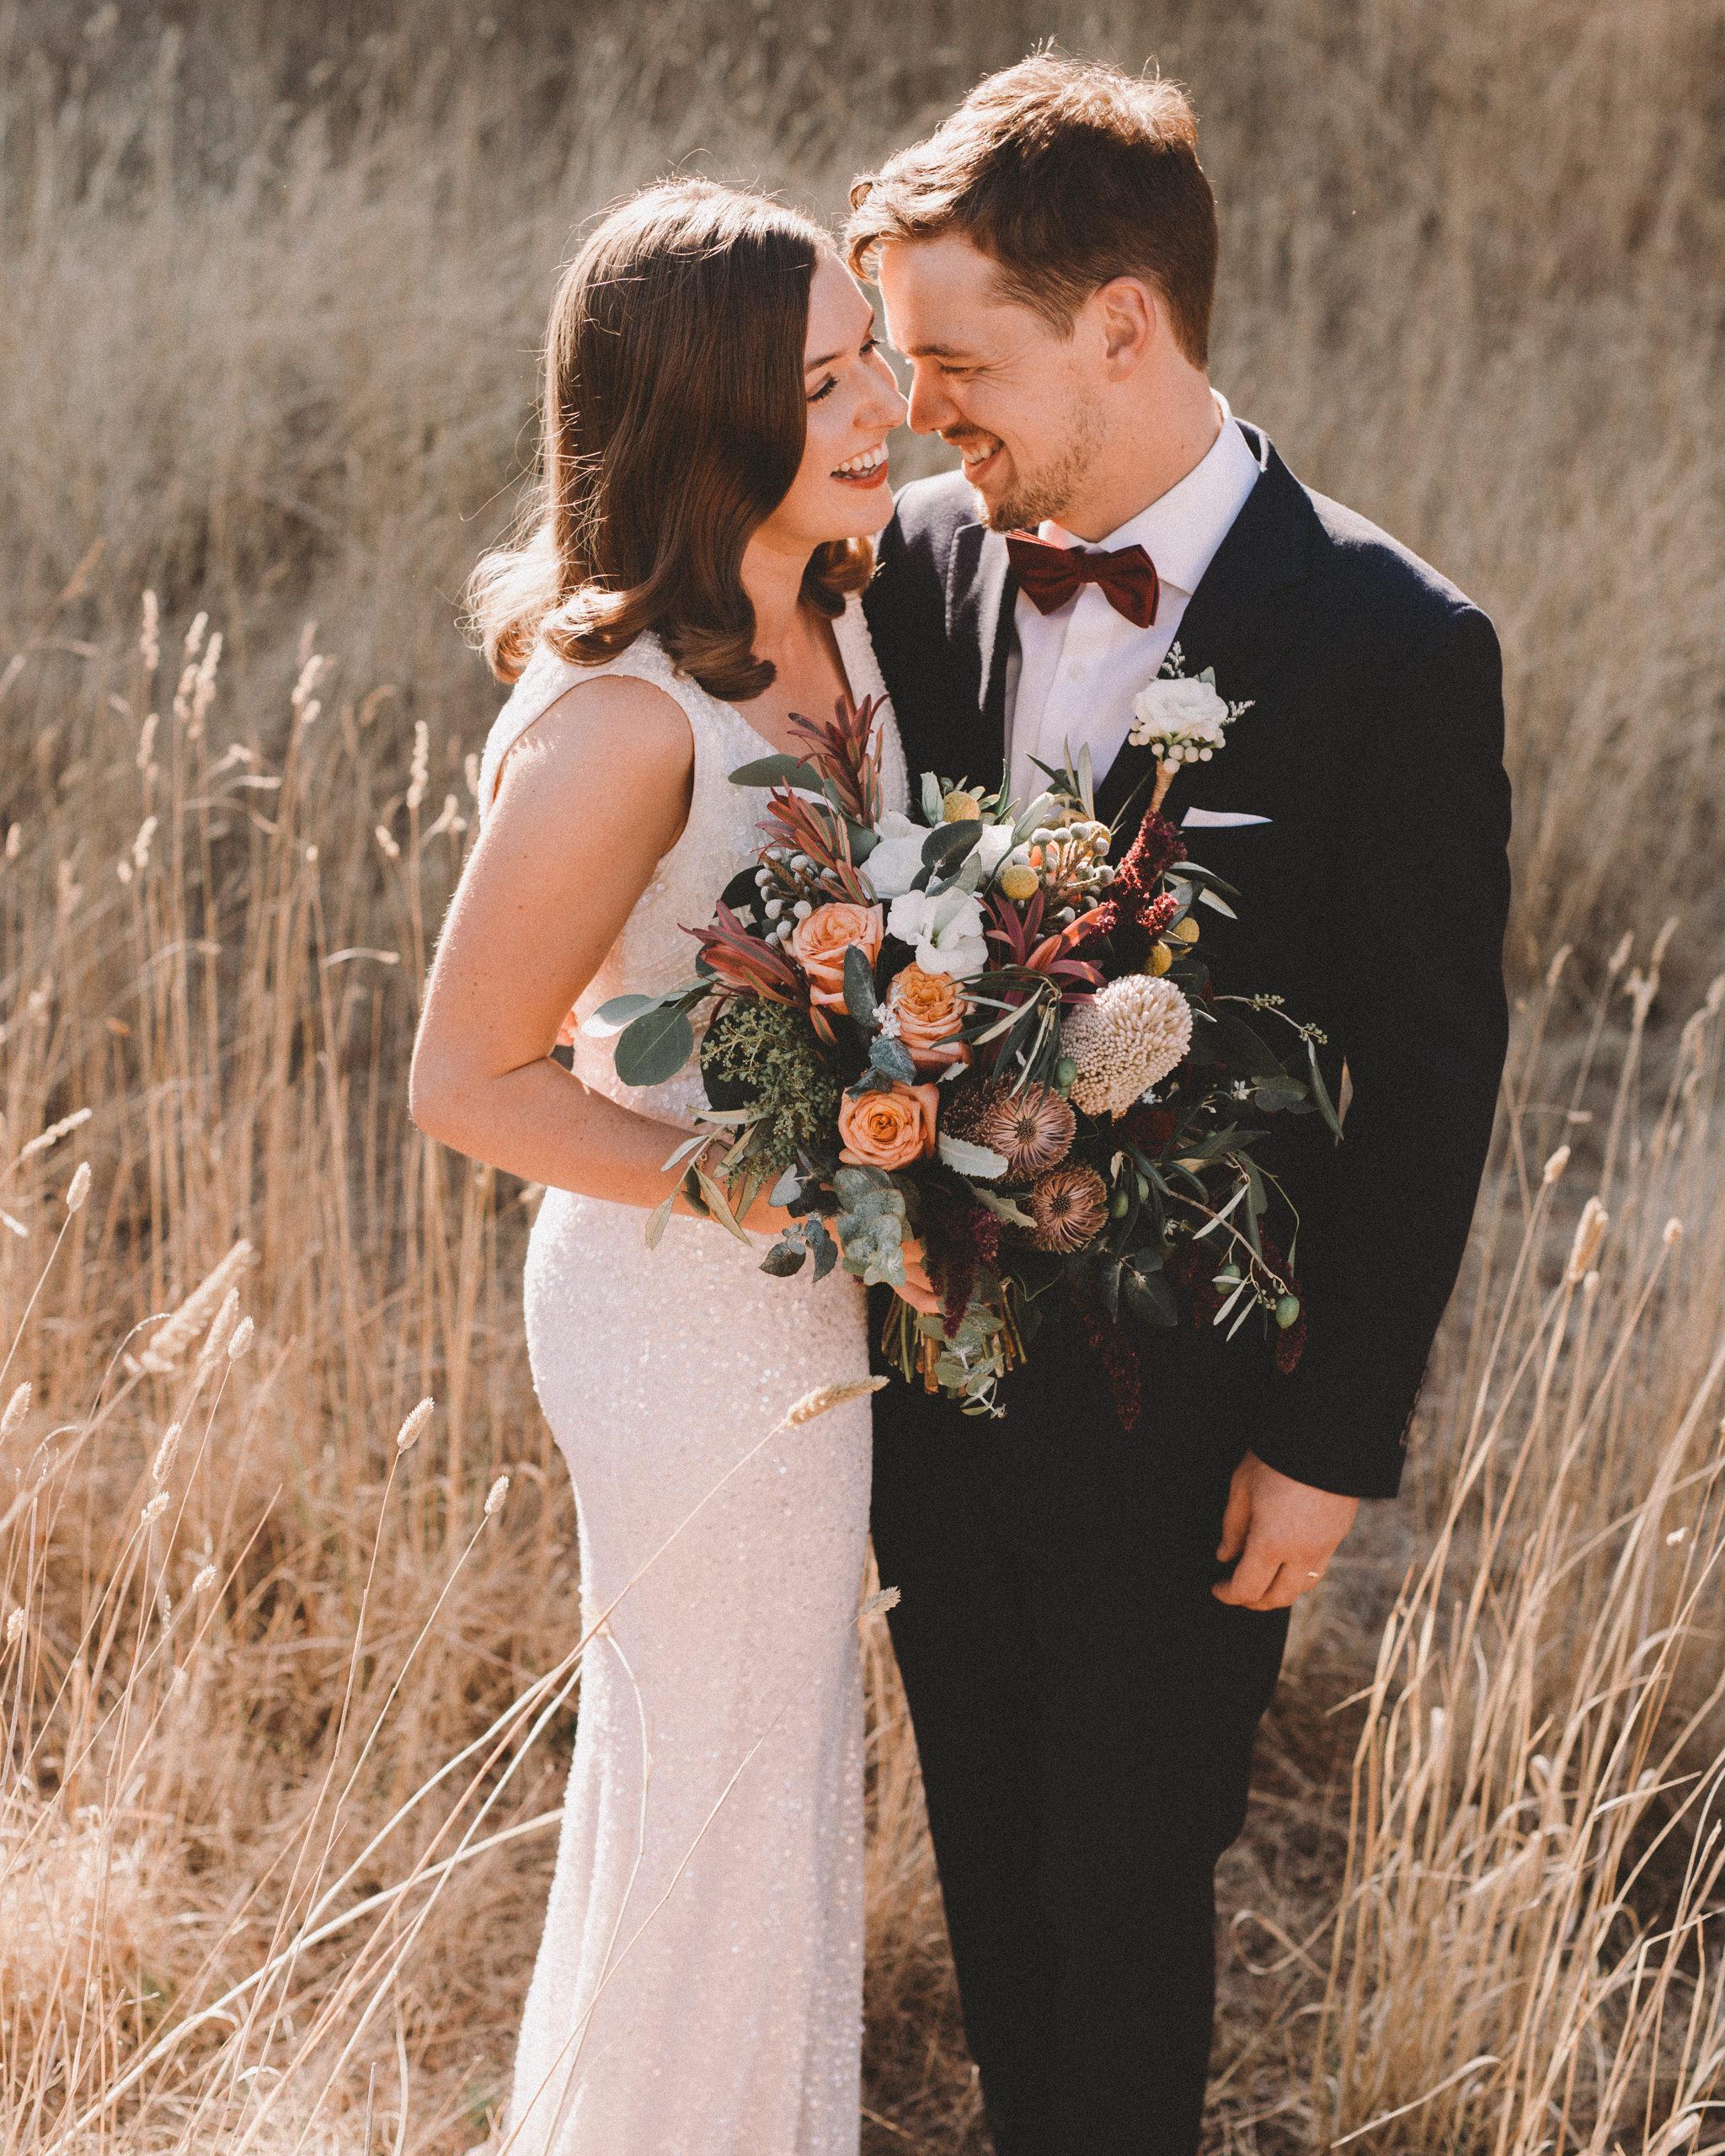 Melbourne Yarra Valley Wedding Photographer 0130.JPG